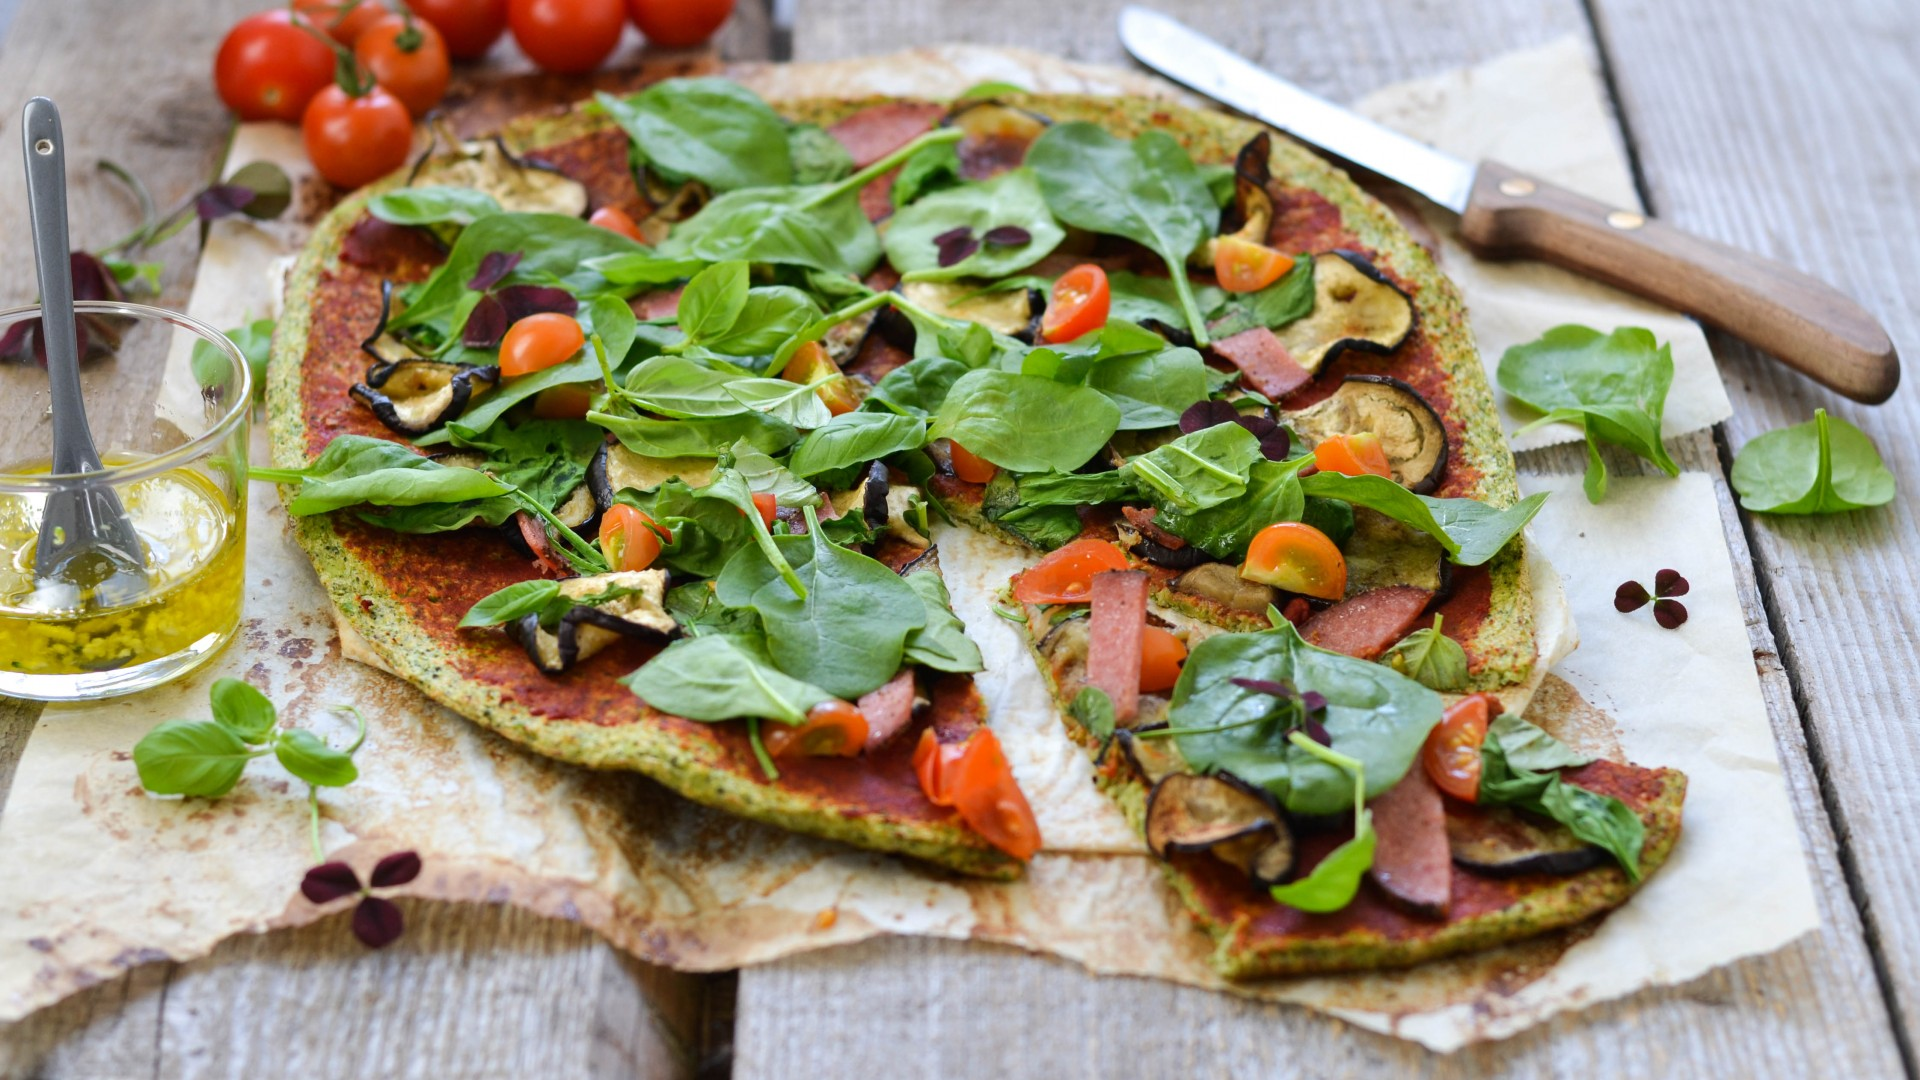 ... pizza, broccoli, parsley, basil, saffron, tomatoes, sausage, zucchini